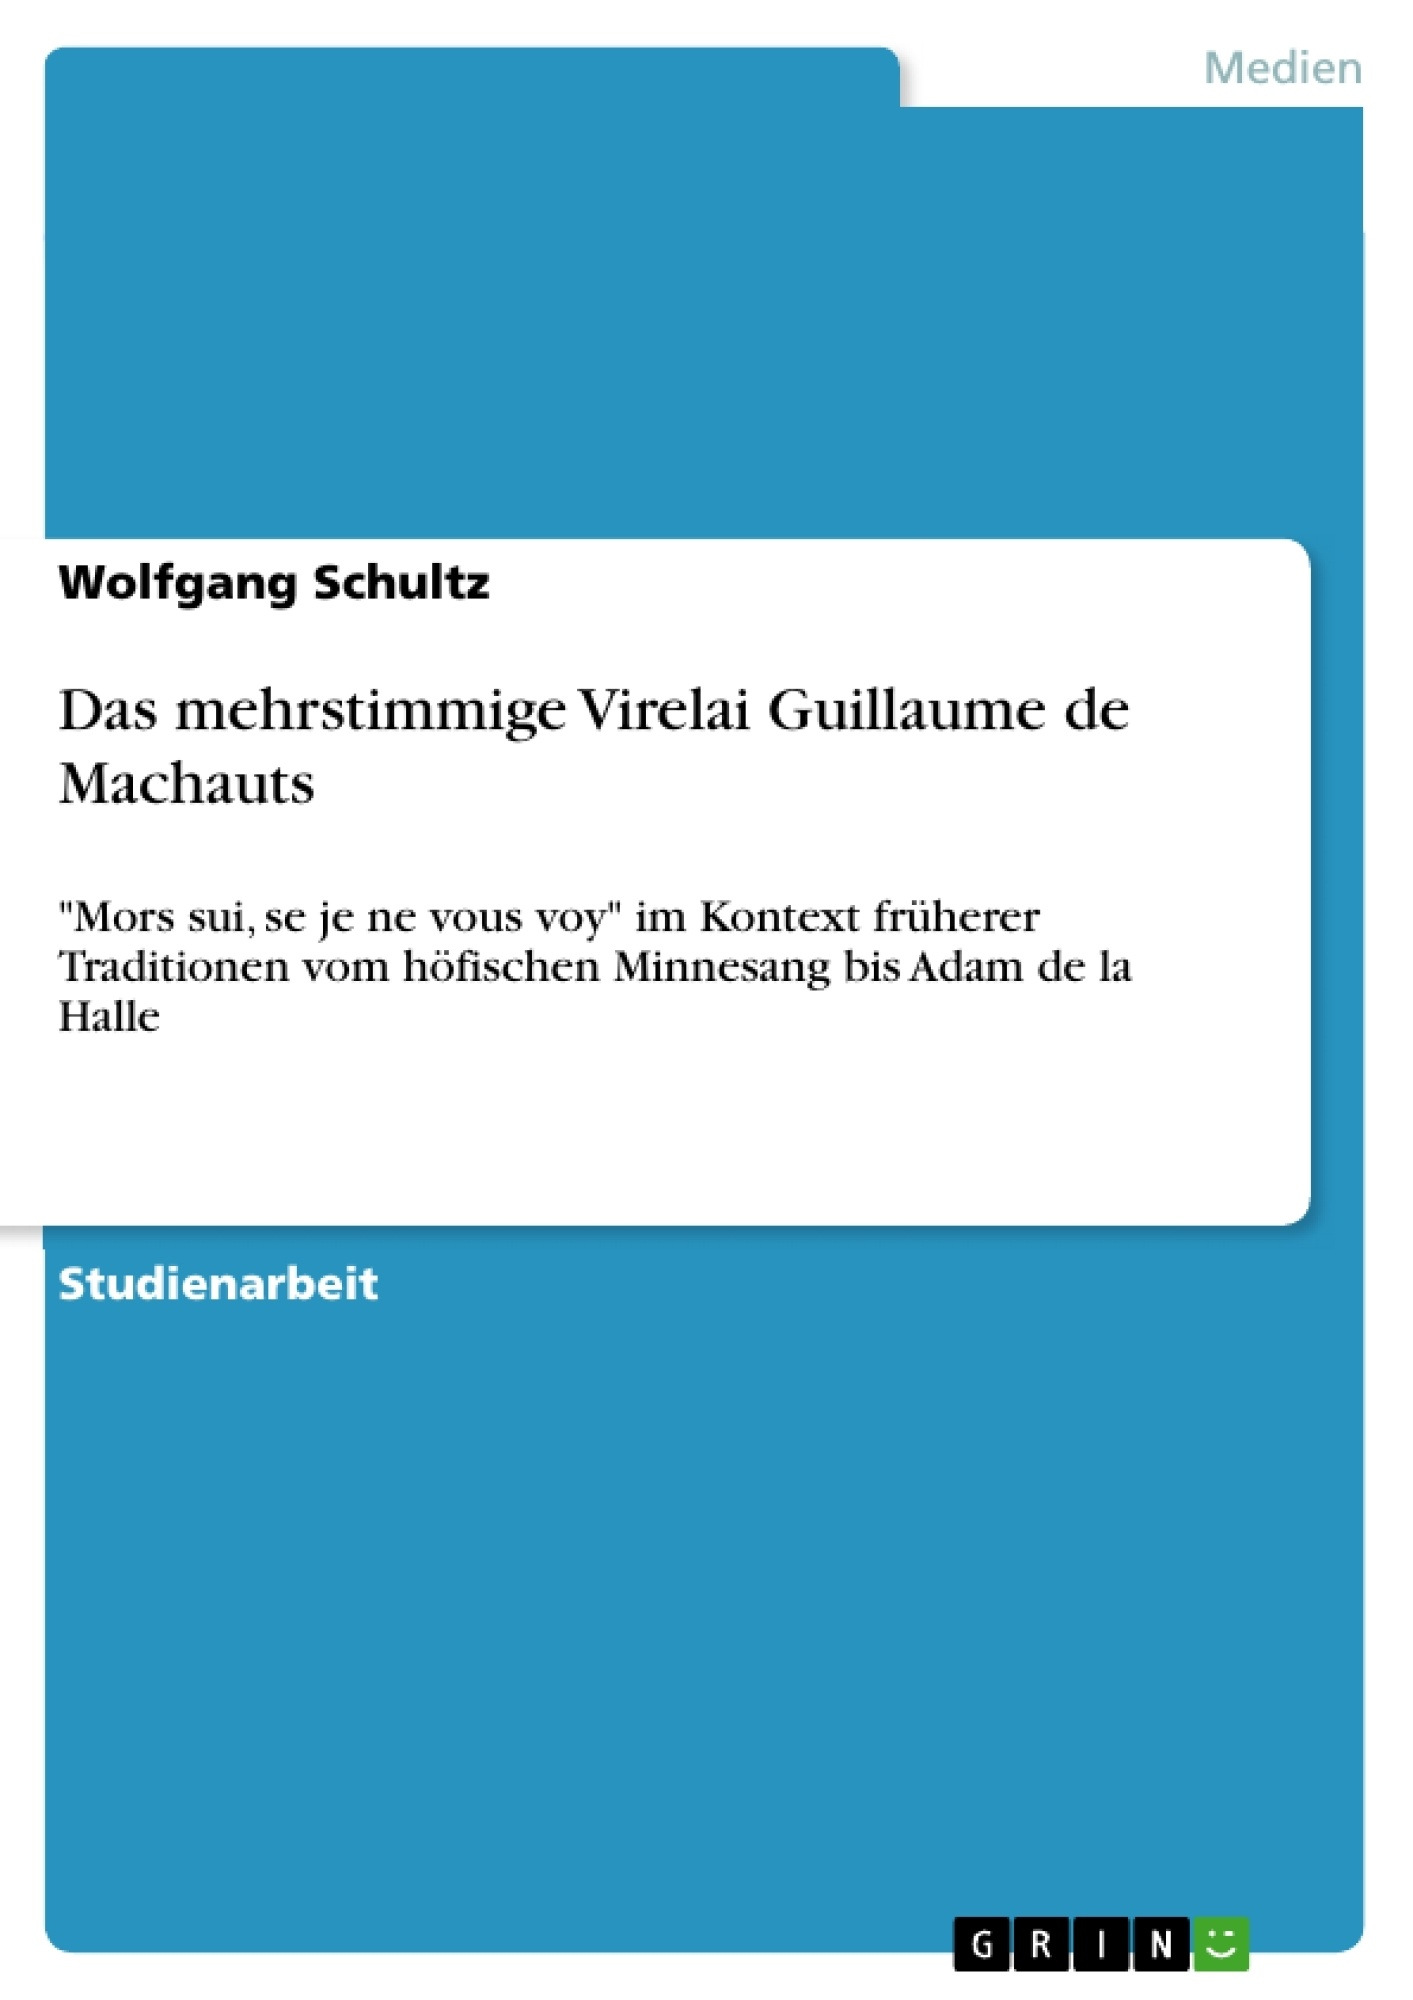 Titel: Das mehrstimmige Virelai Guillaume de Machauts